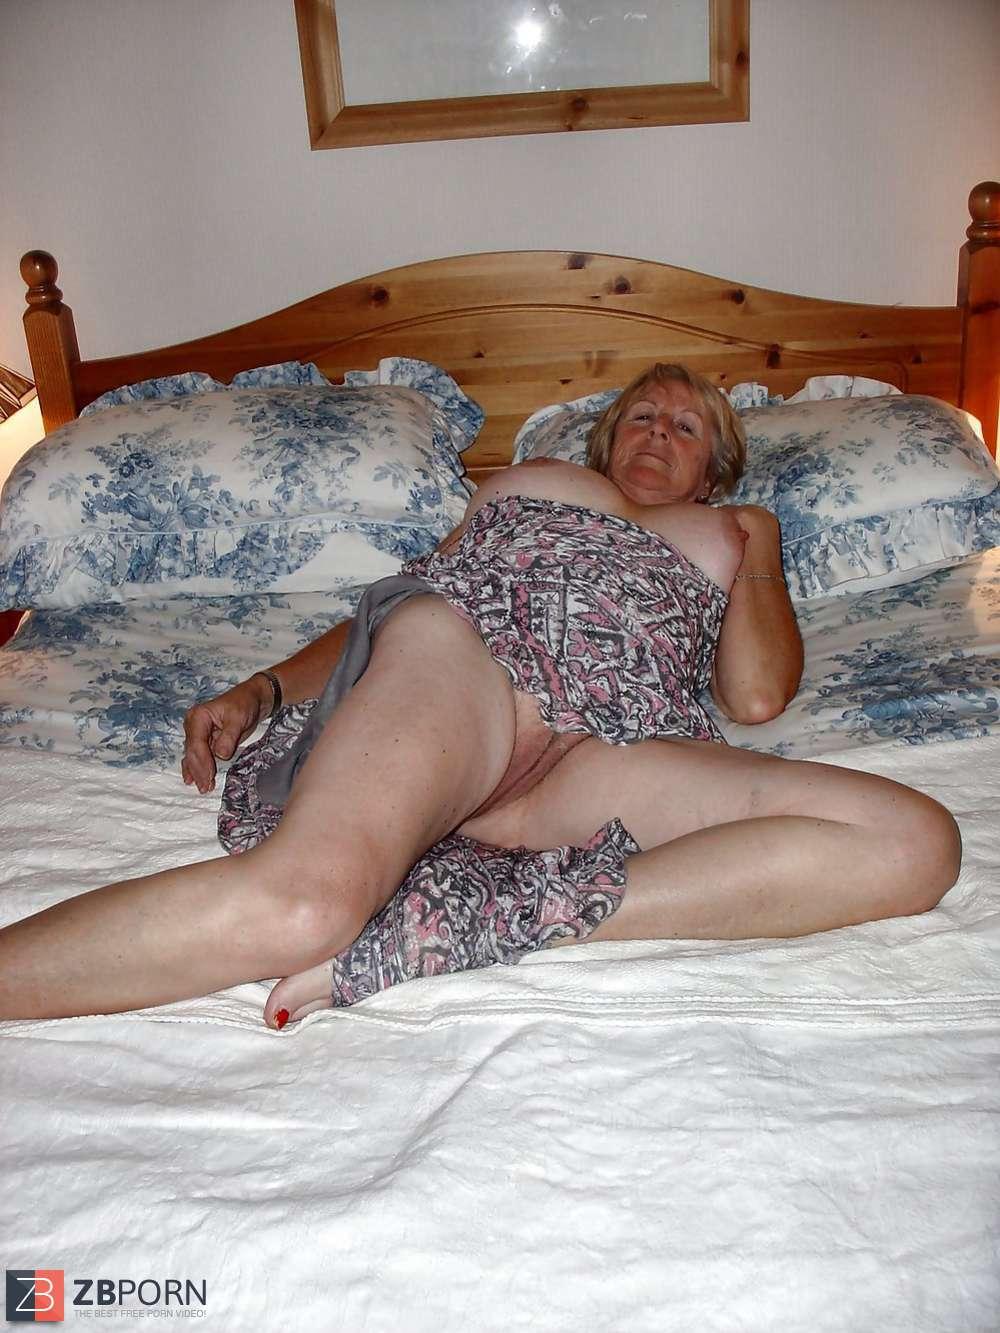 accidental granny upskirts - Oma Accidental Upskirt …